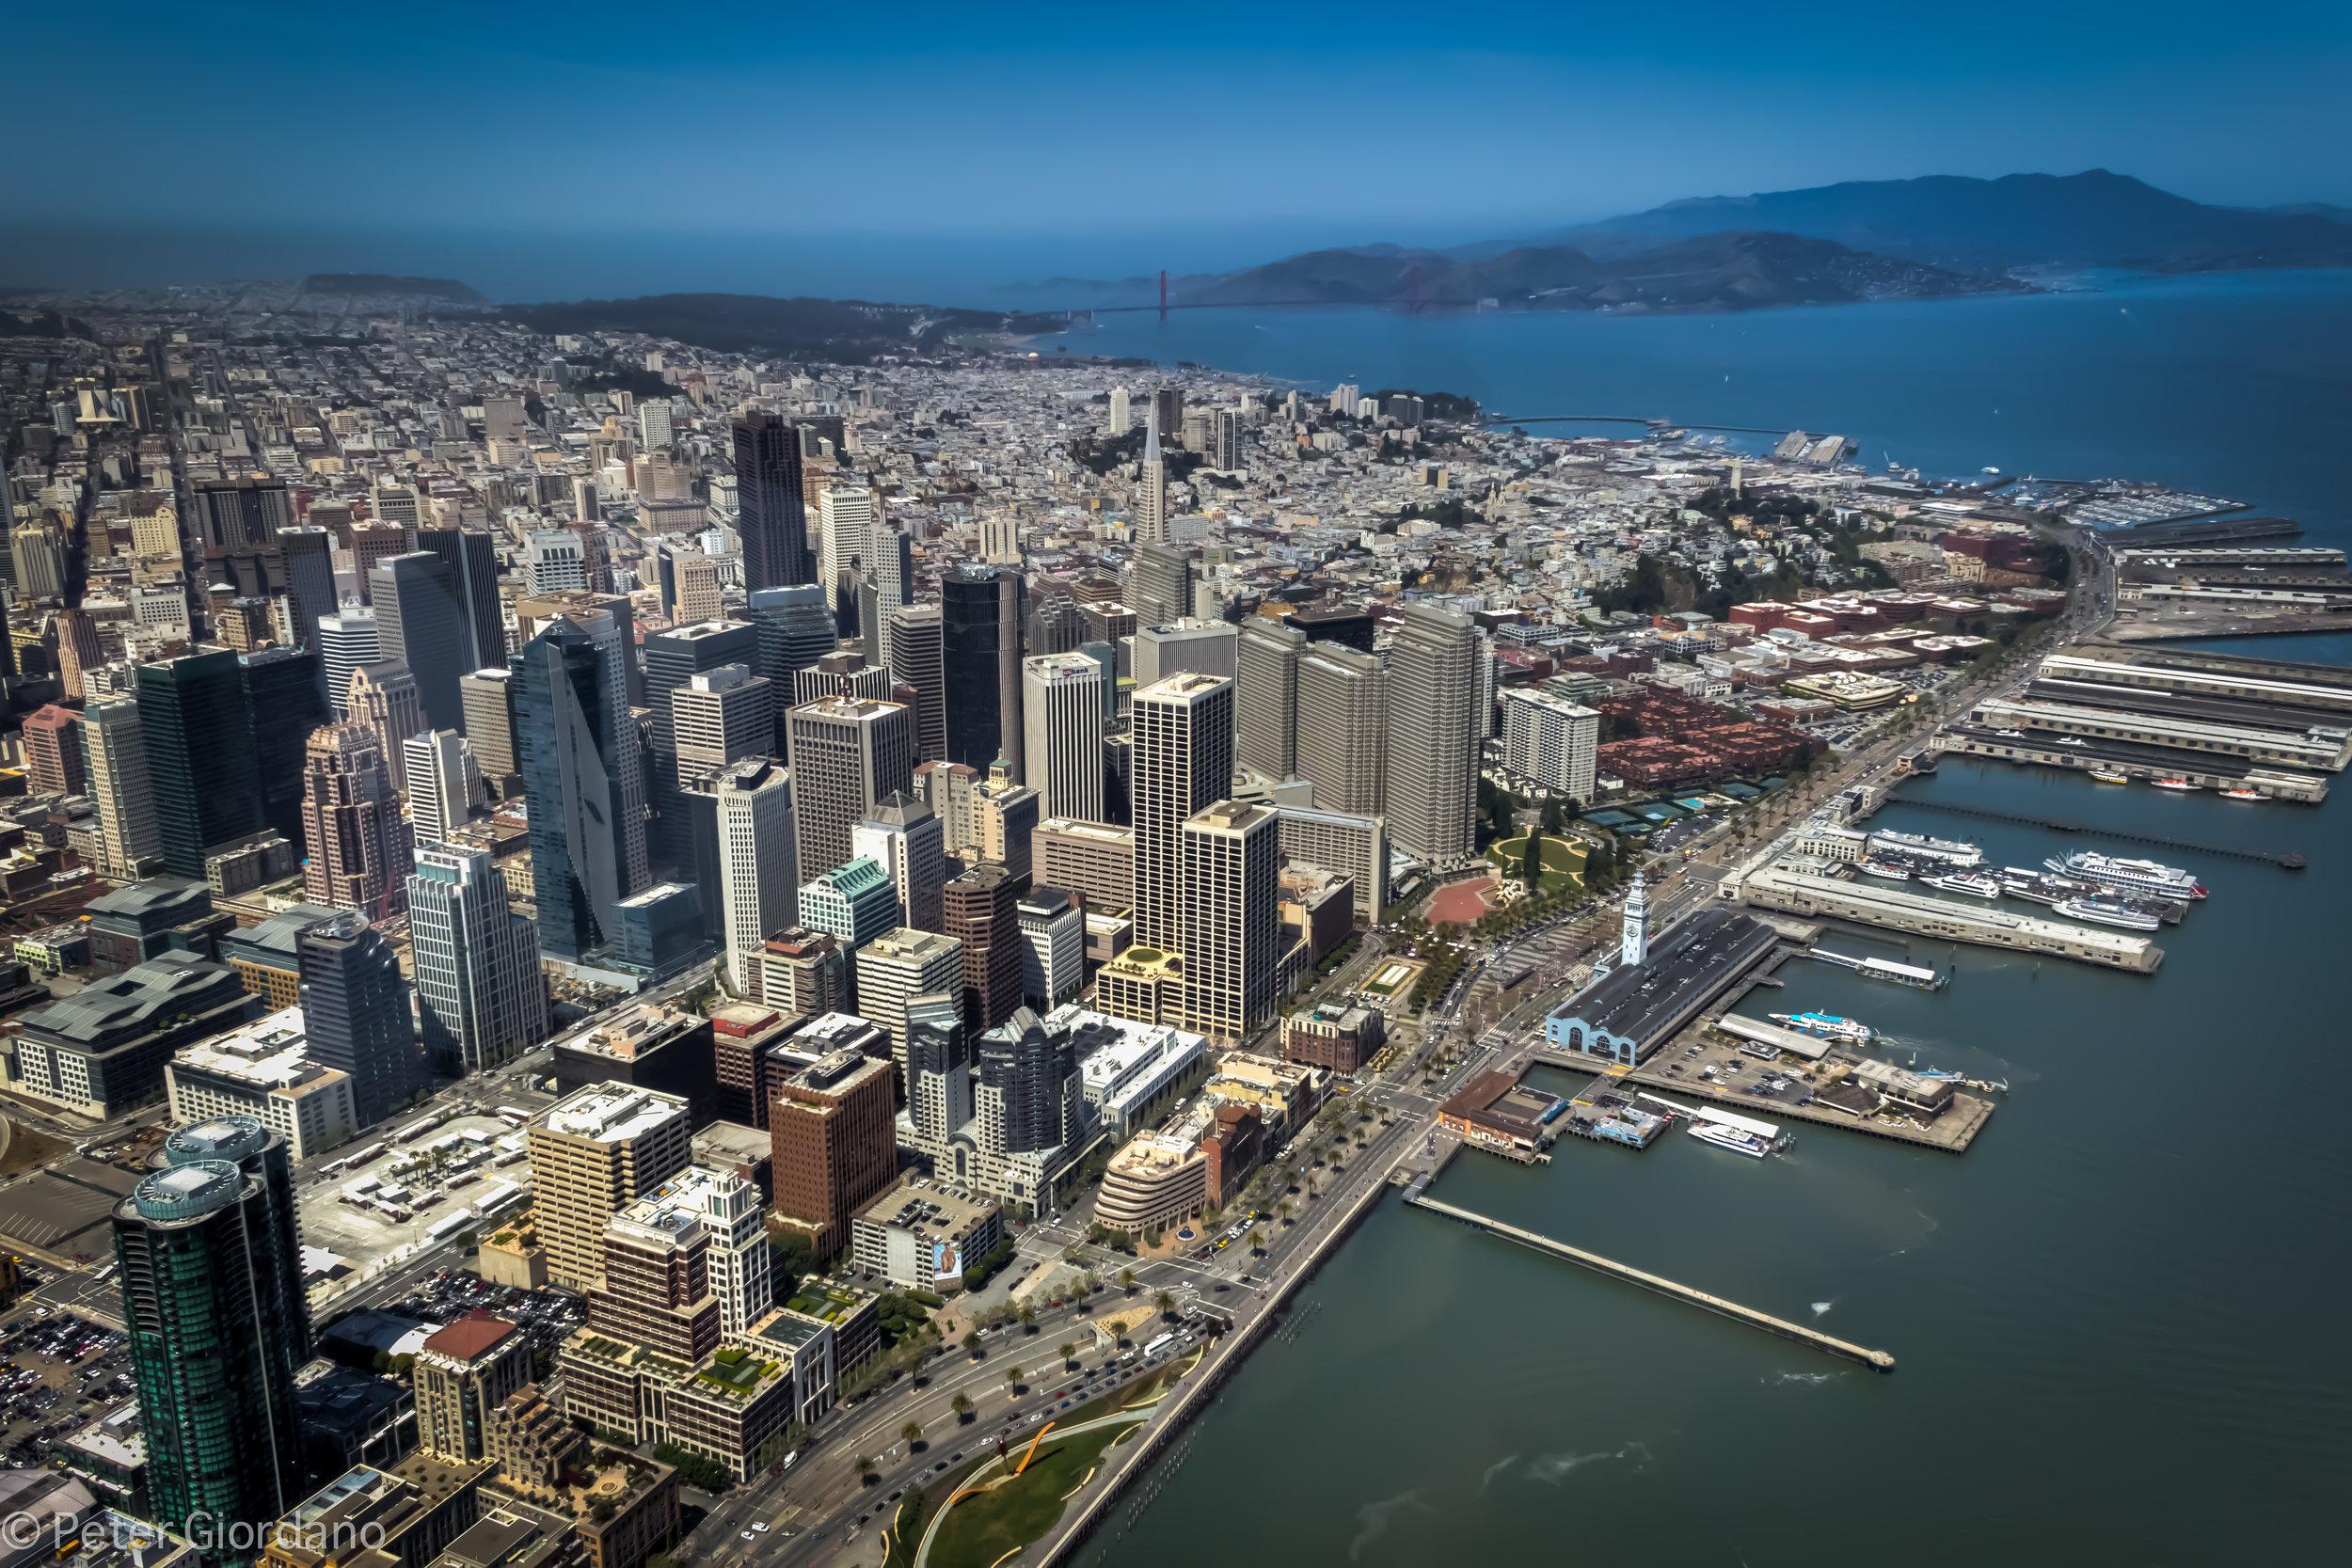 Zeppelin View of SF and Golden Gate Bridge-5184 x 3456.jpg